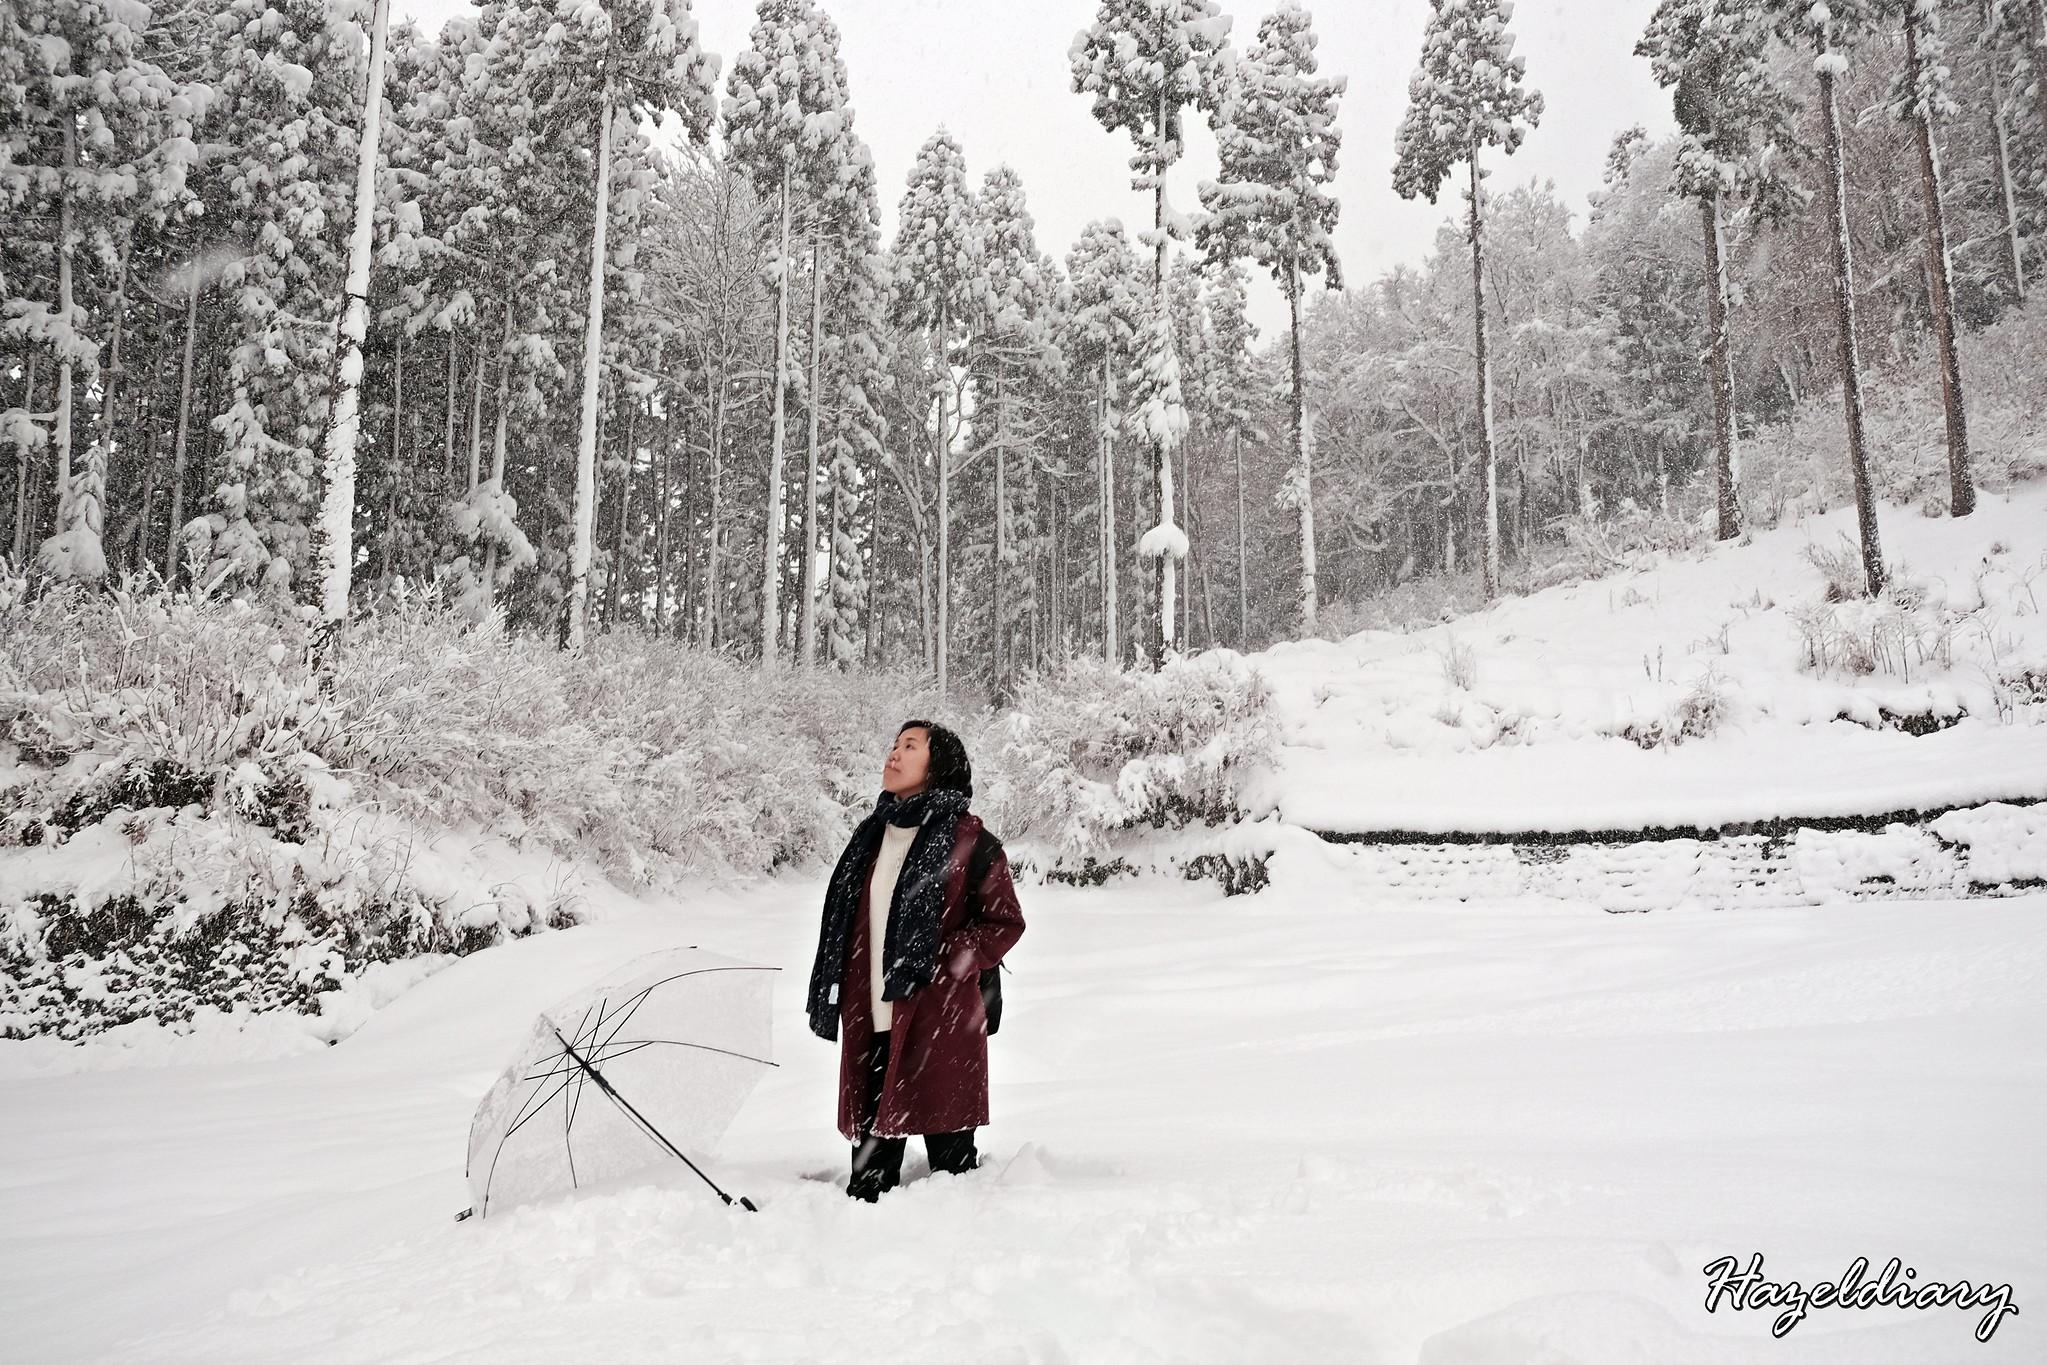 Echigo Yuzawa Japan-Hazeldiary-5